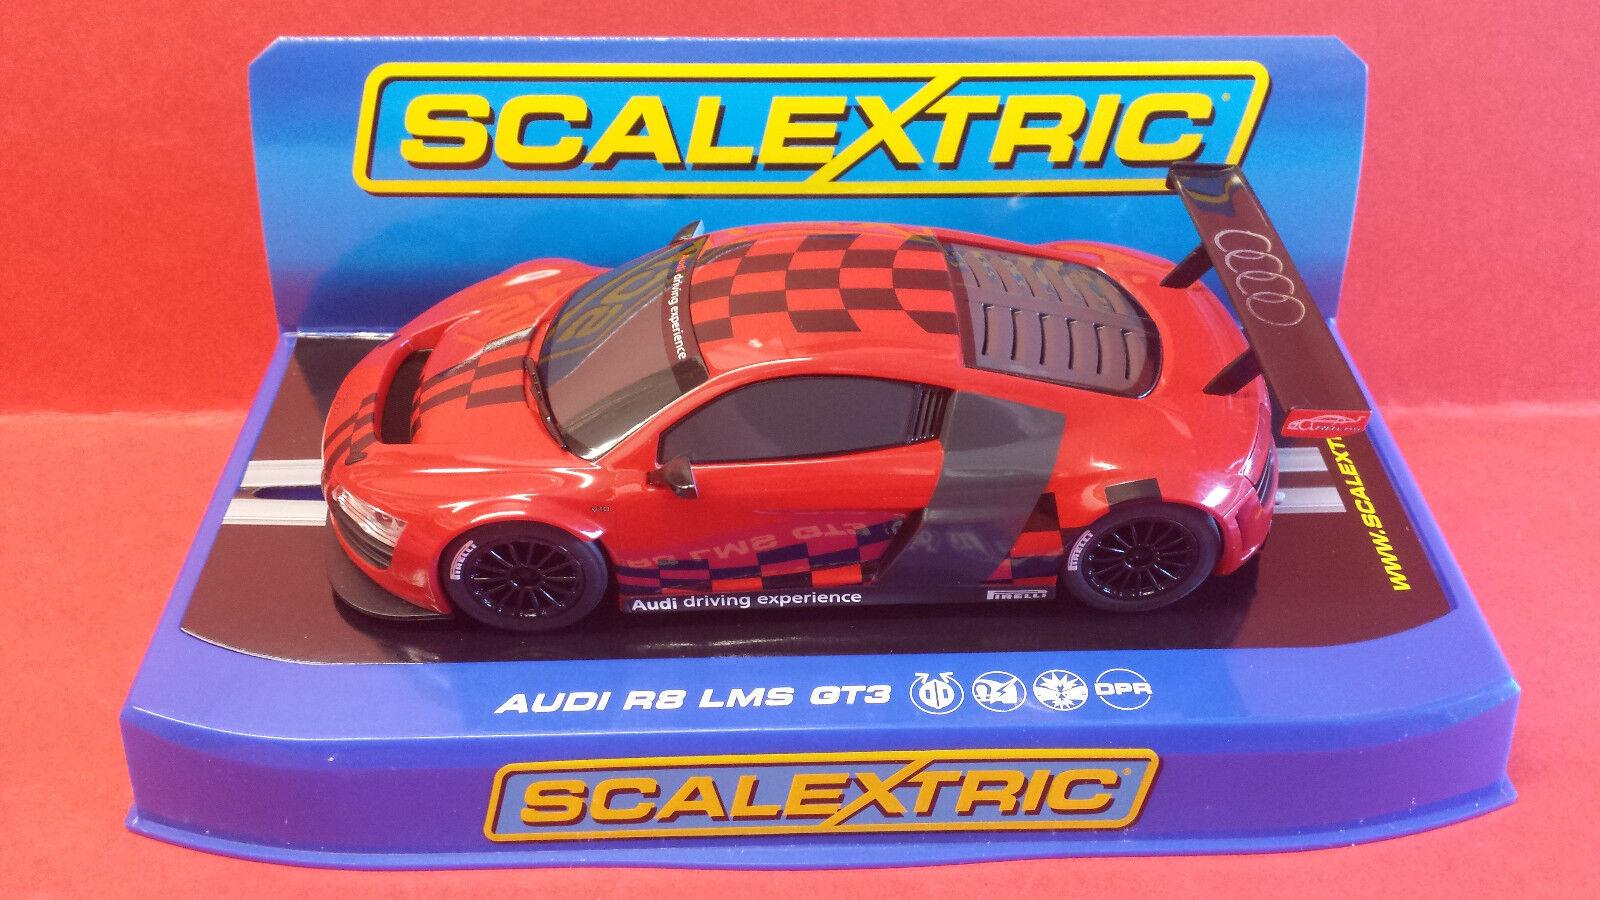 SCALEXTRIC C3177 AIDI R8 LMS RACE EXPERIENCE SUPER RESISTANT.